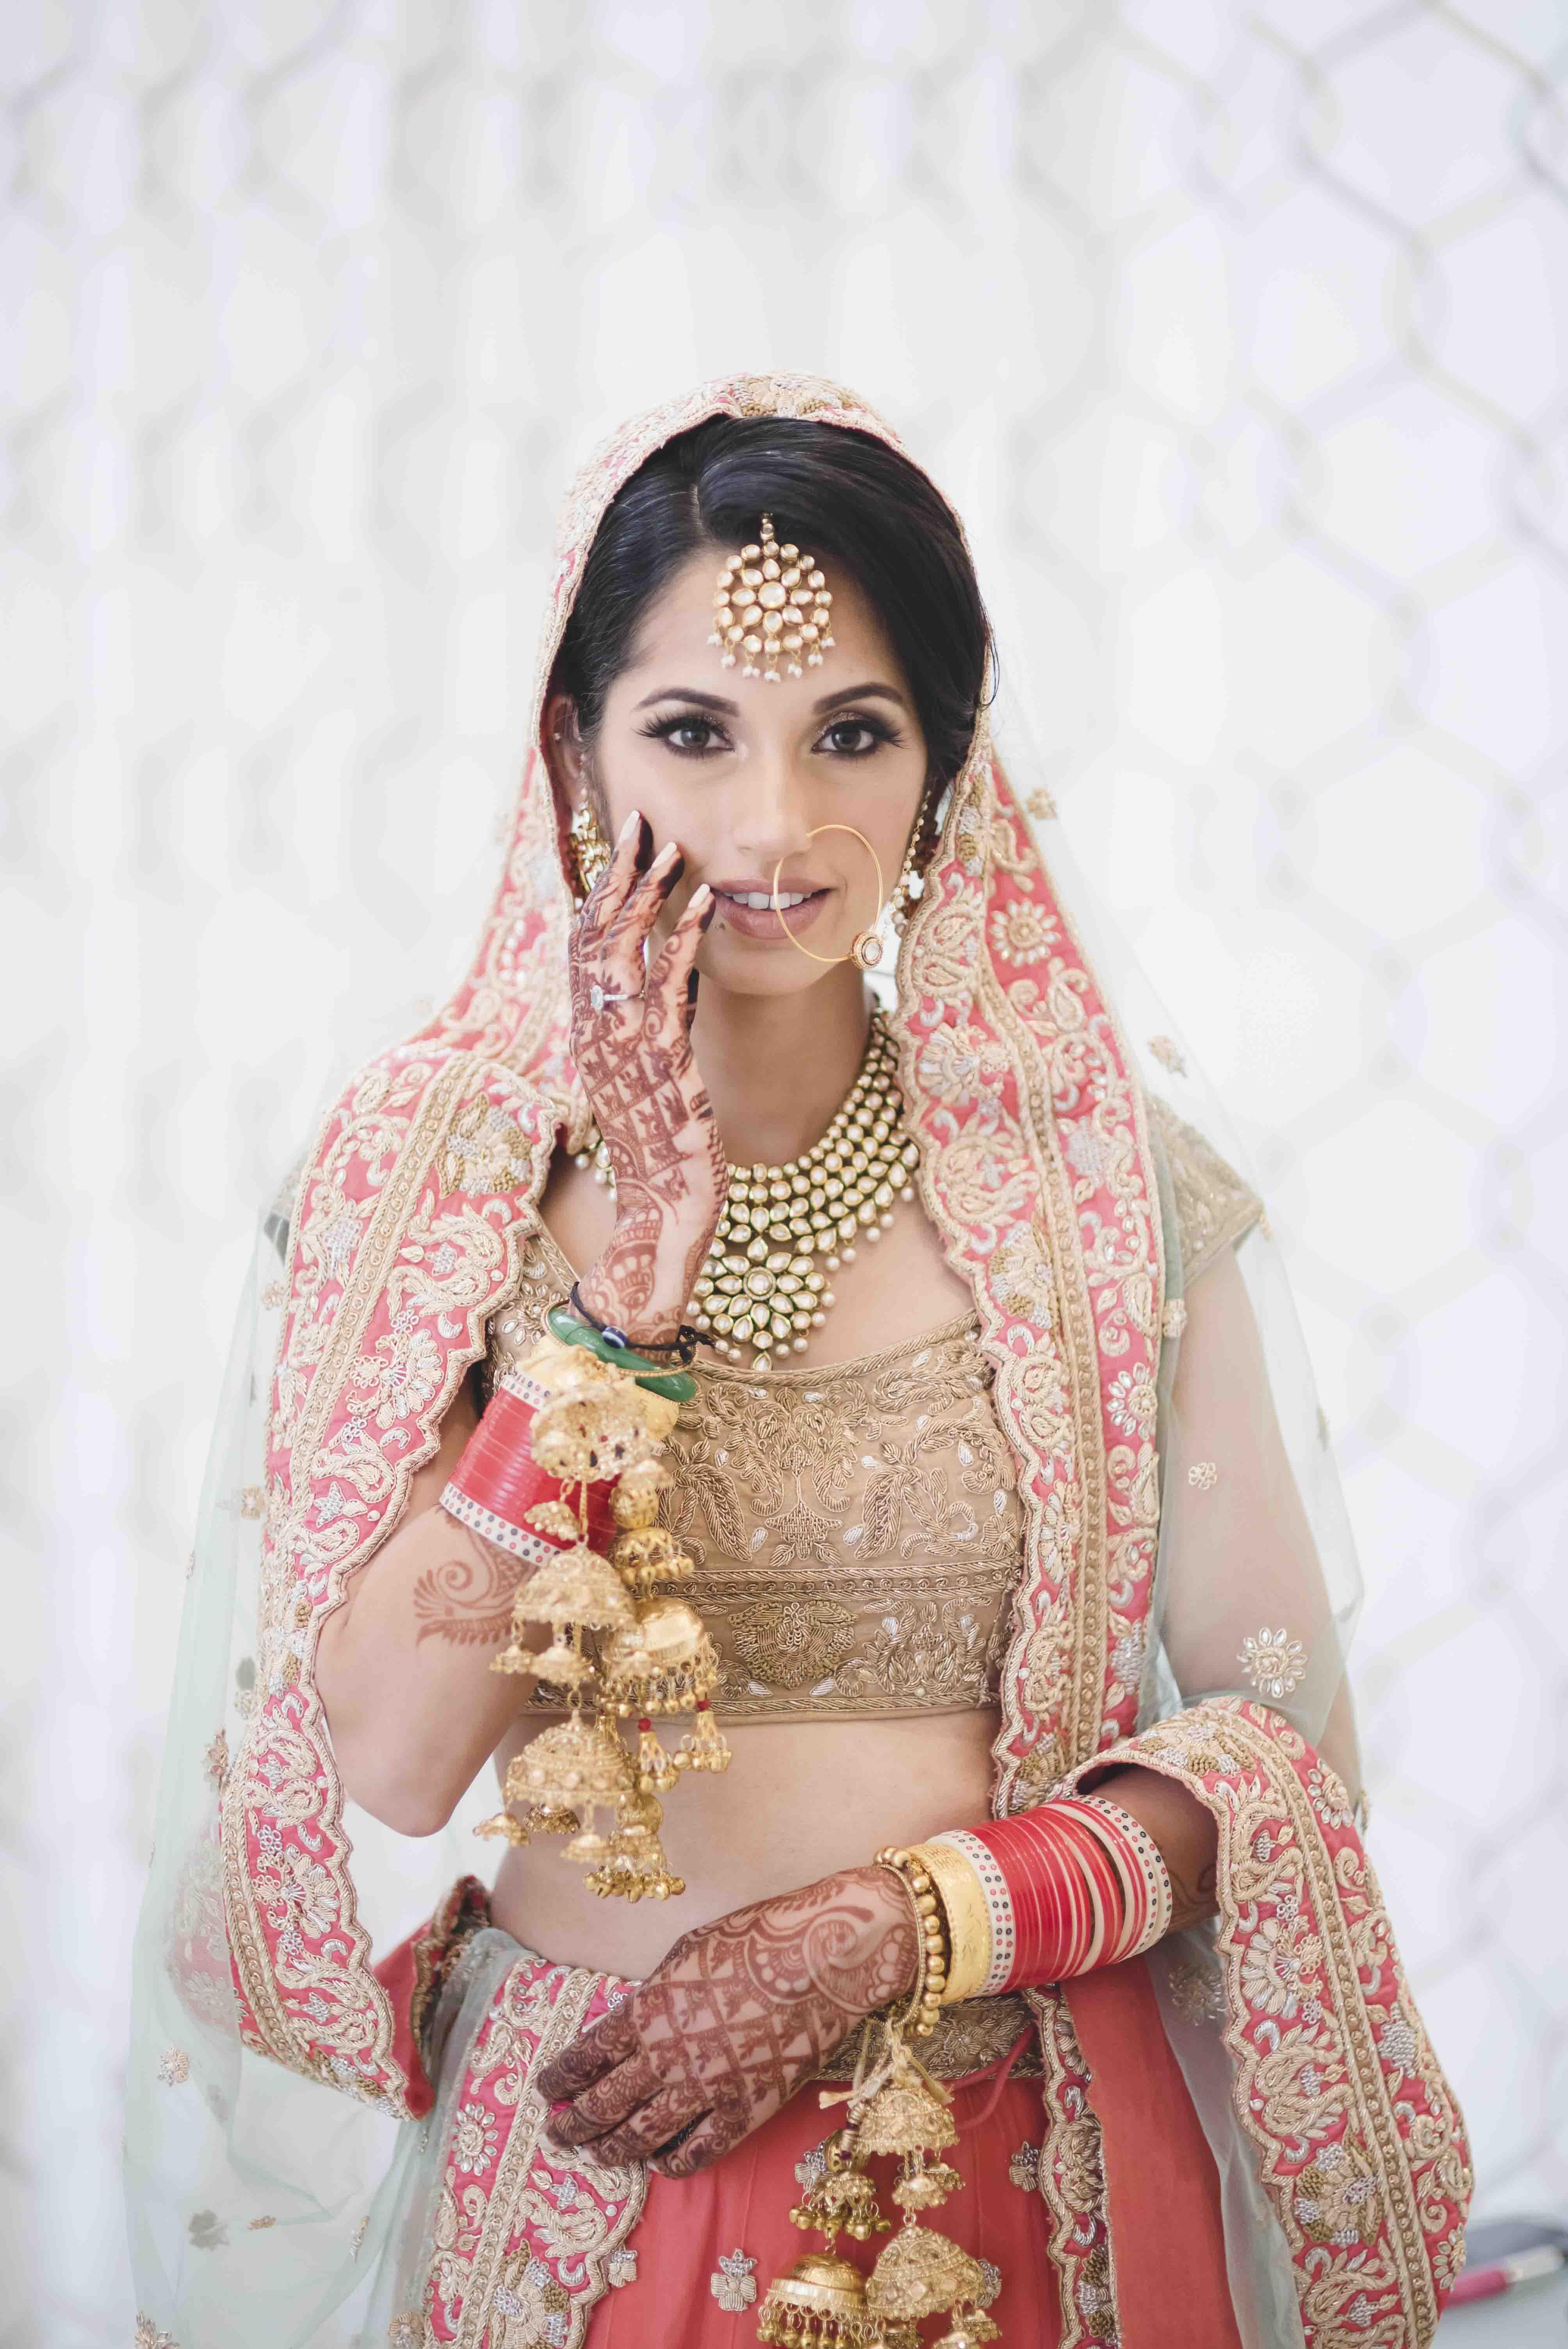 83218d1a44dc3 Indian Wedding Photographer | Focus Photography in Toronto